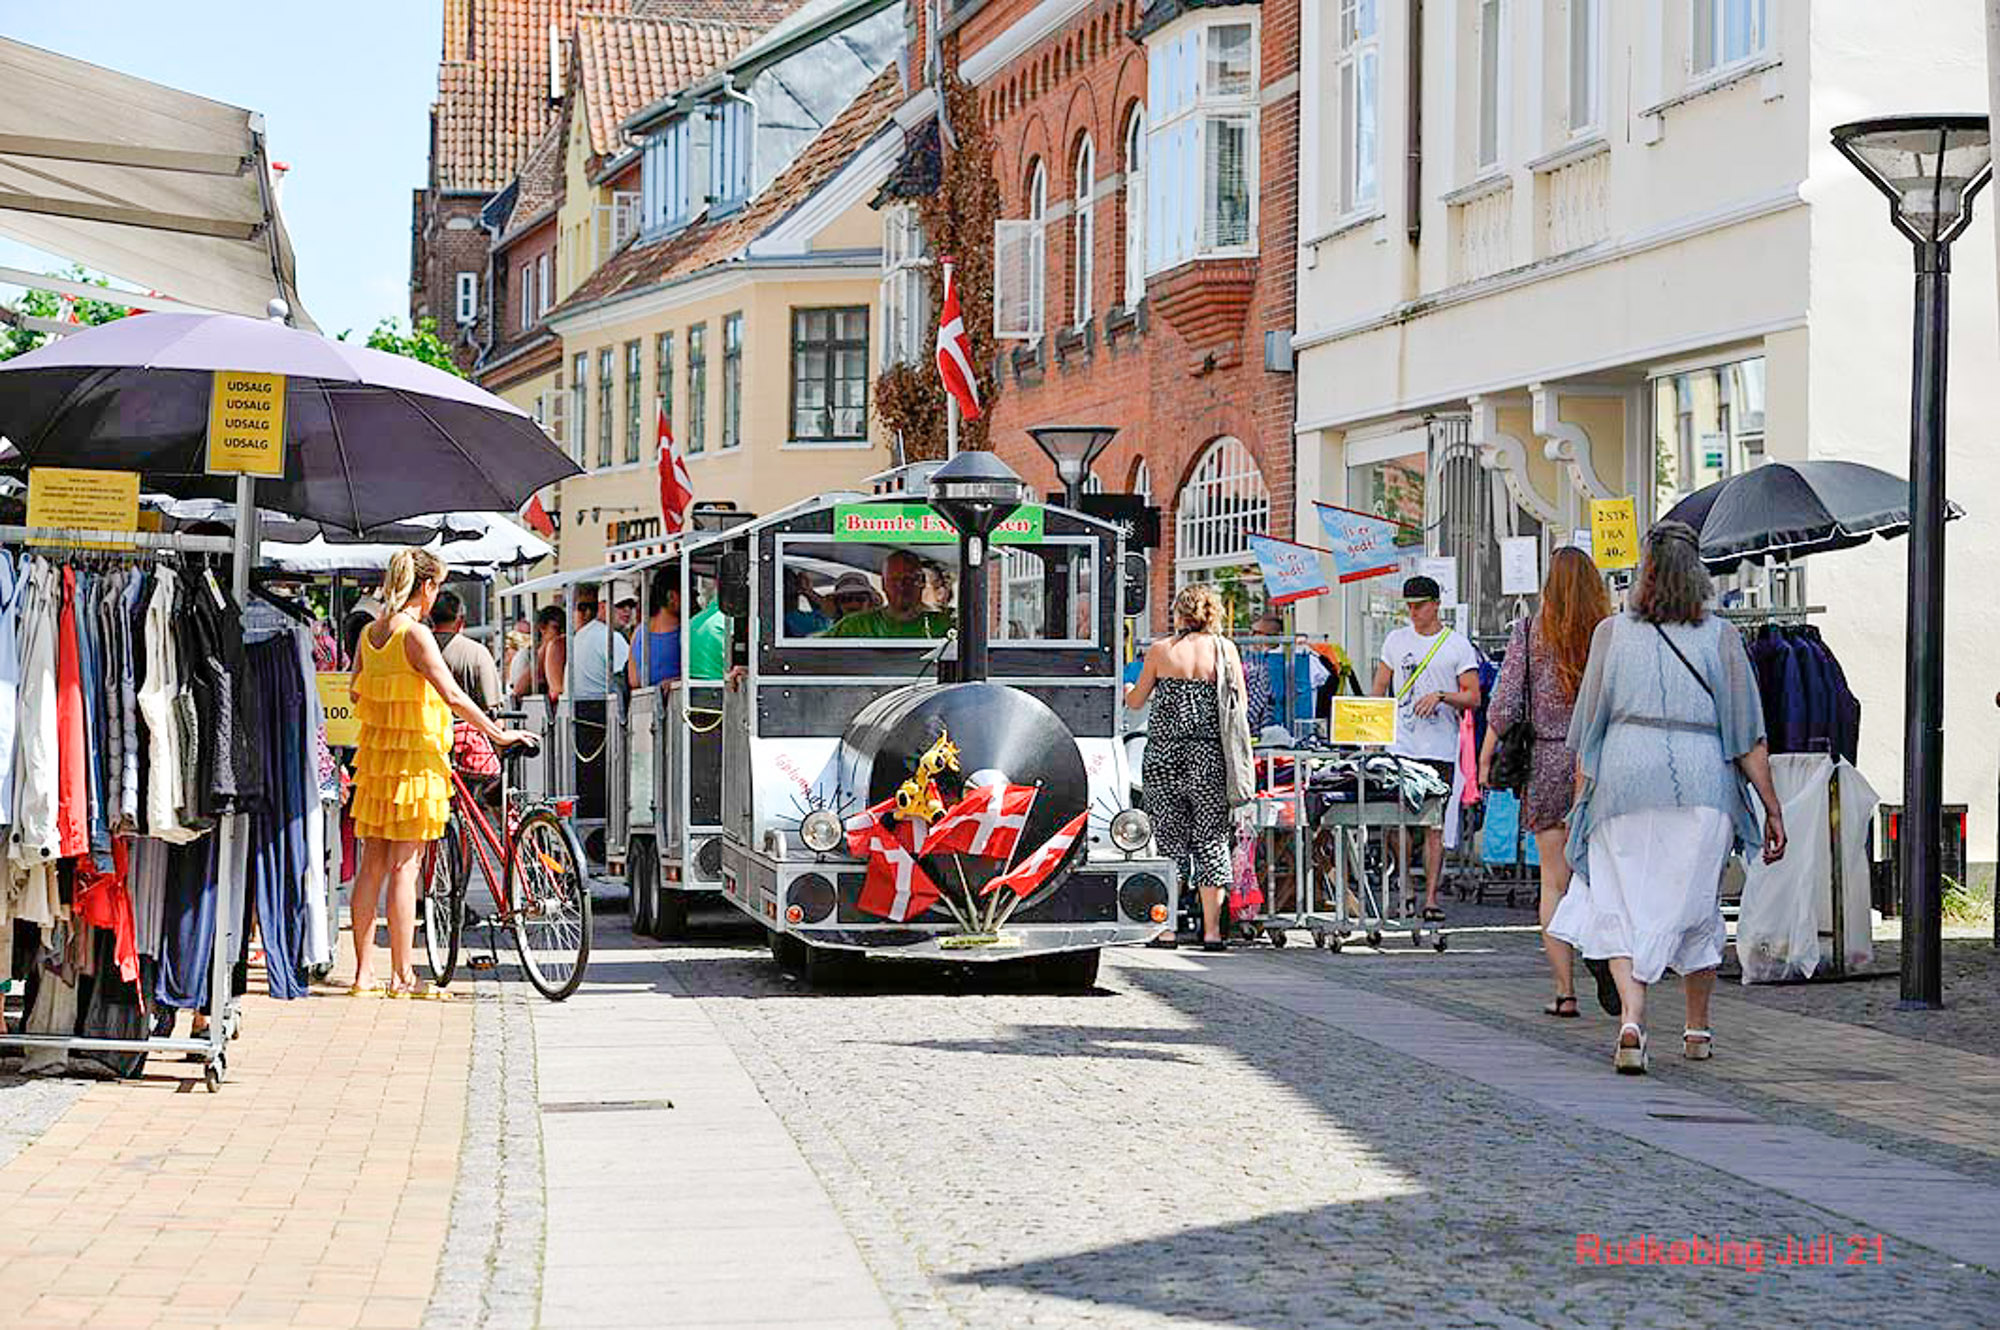 Rudkøbing Handelstandsforening - Langelandsfestival tog